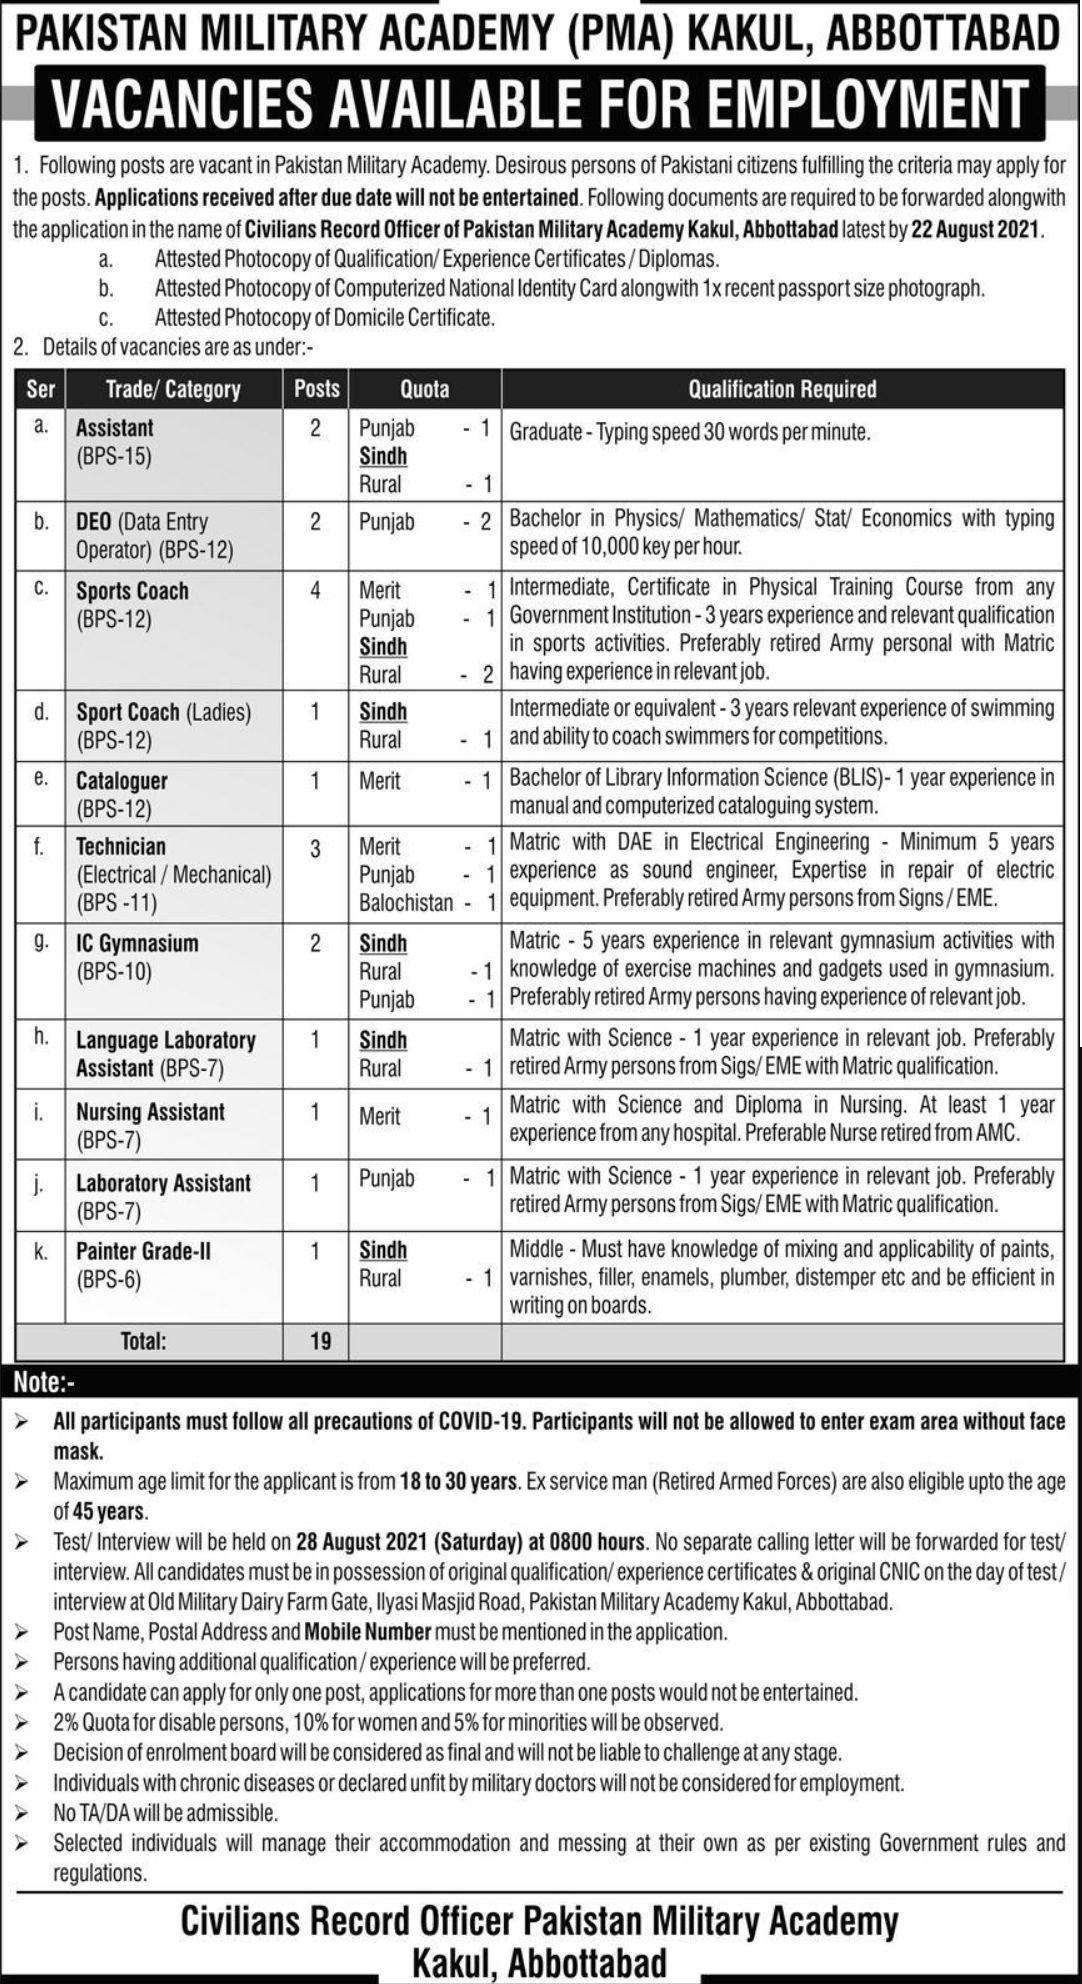 Pakistan Military Academy PMA Kakul Vacancies 2021 3